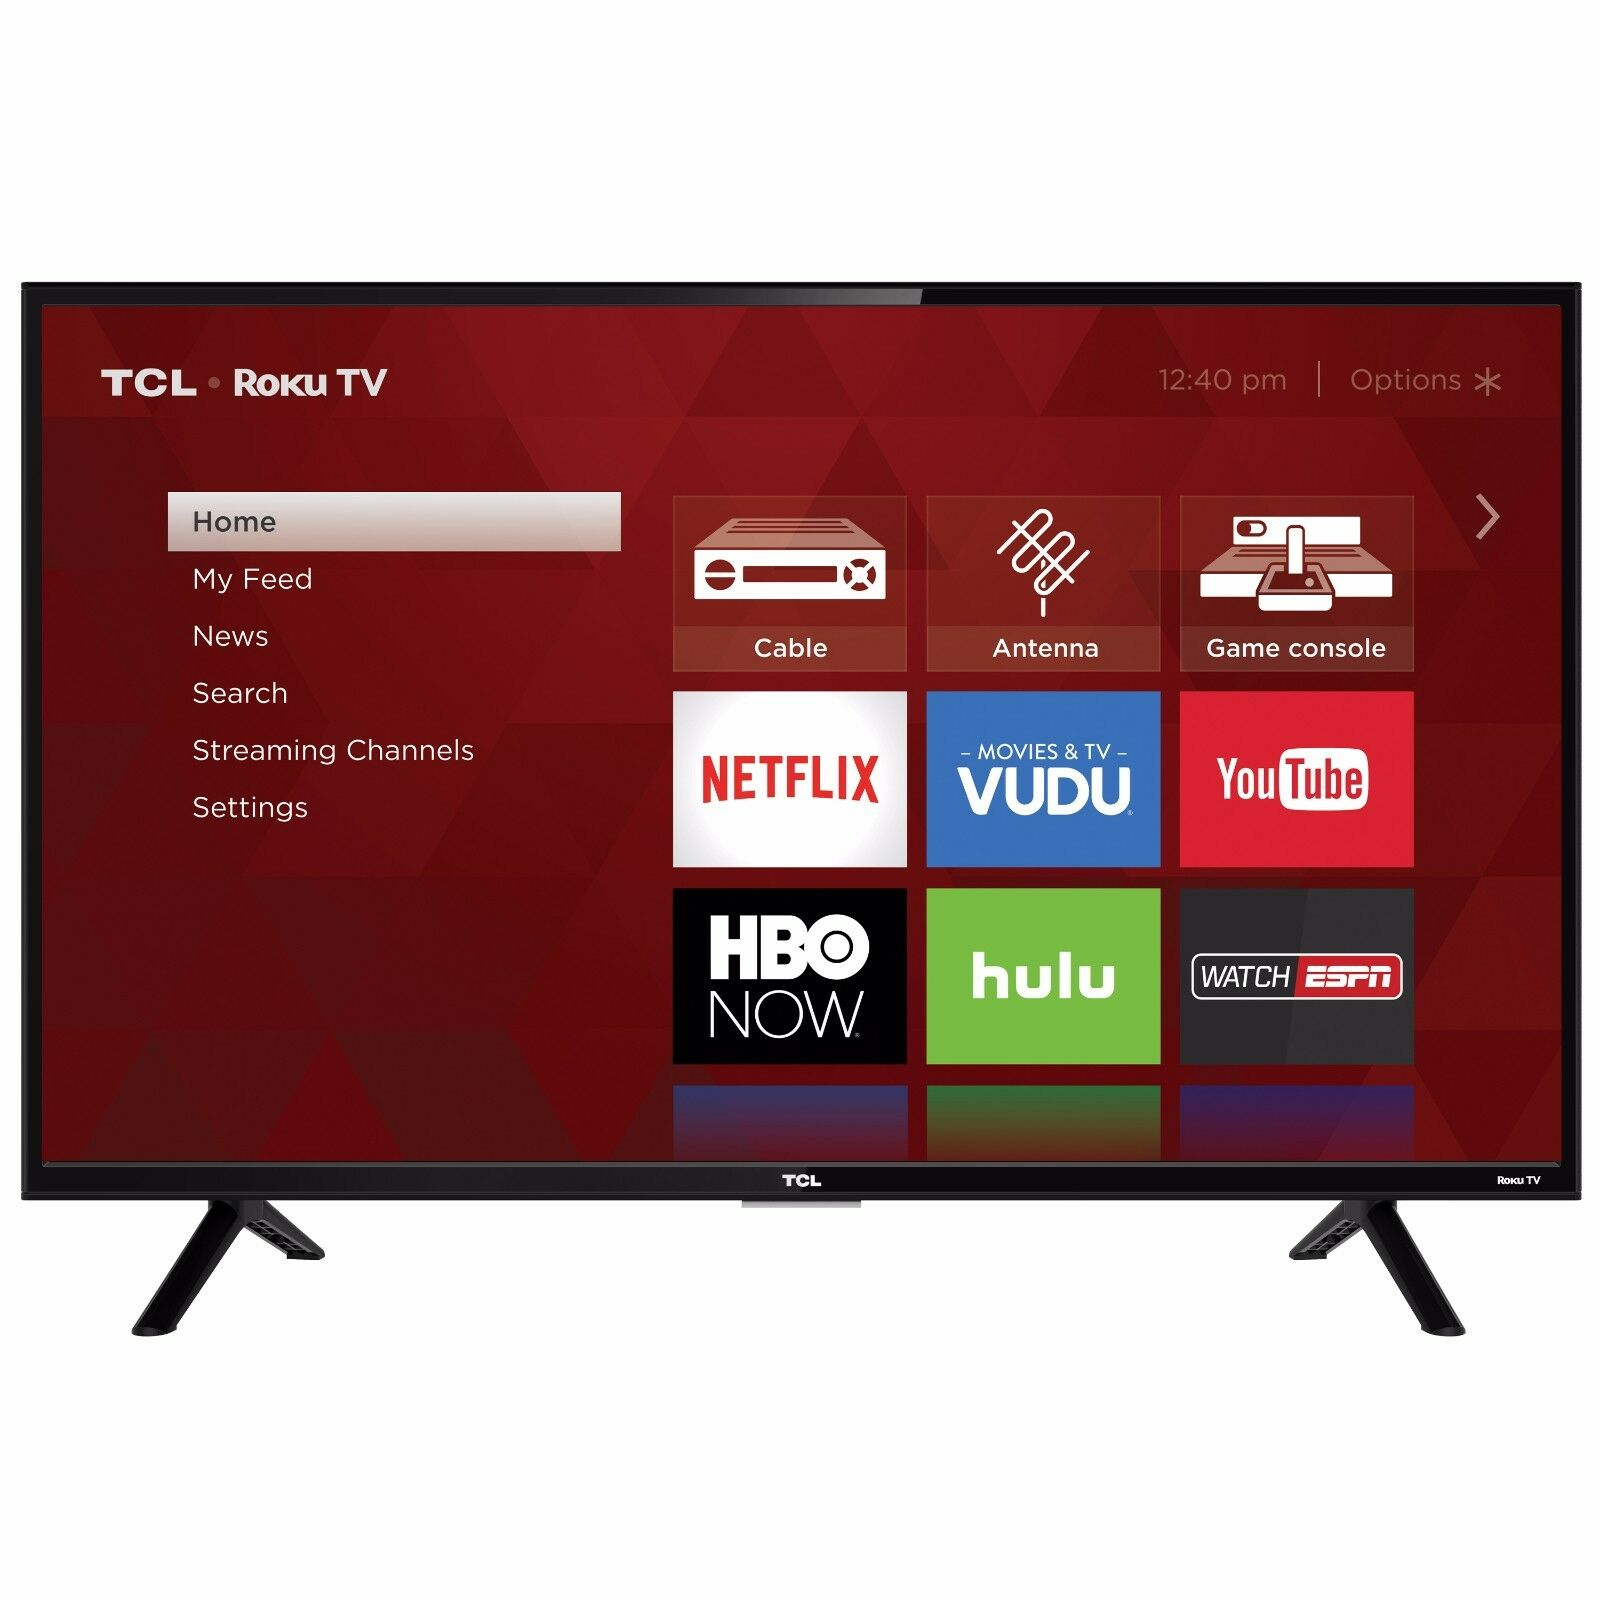 Smart LED LCD HDTV TCL 32